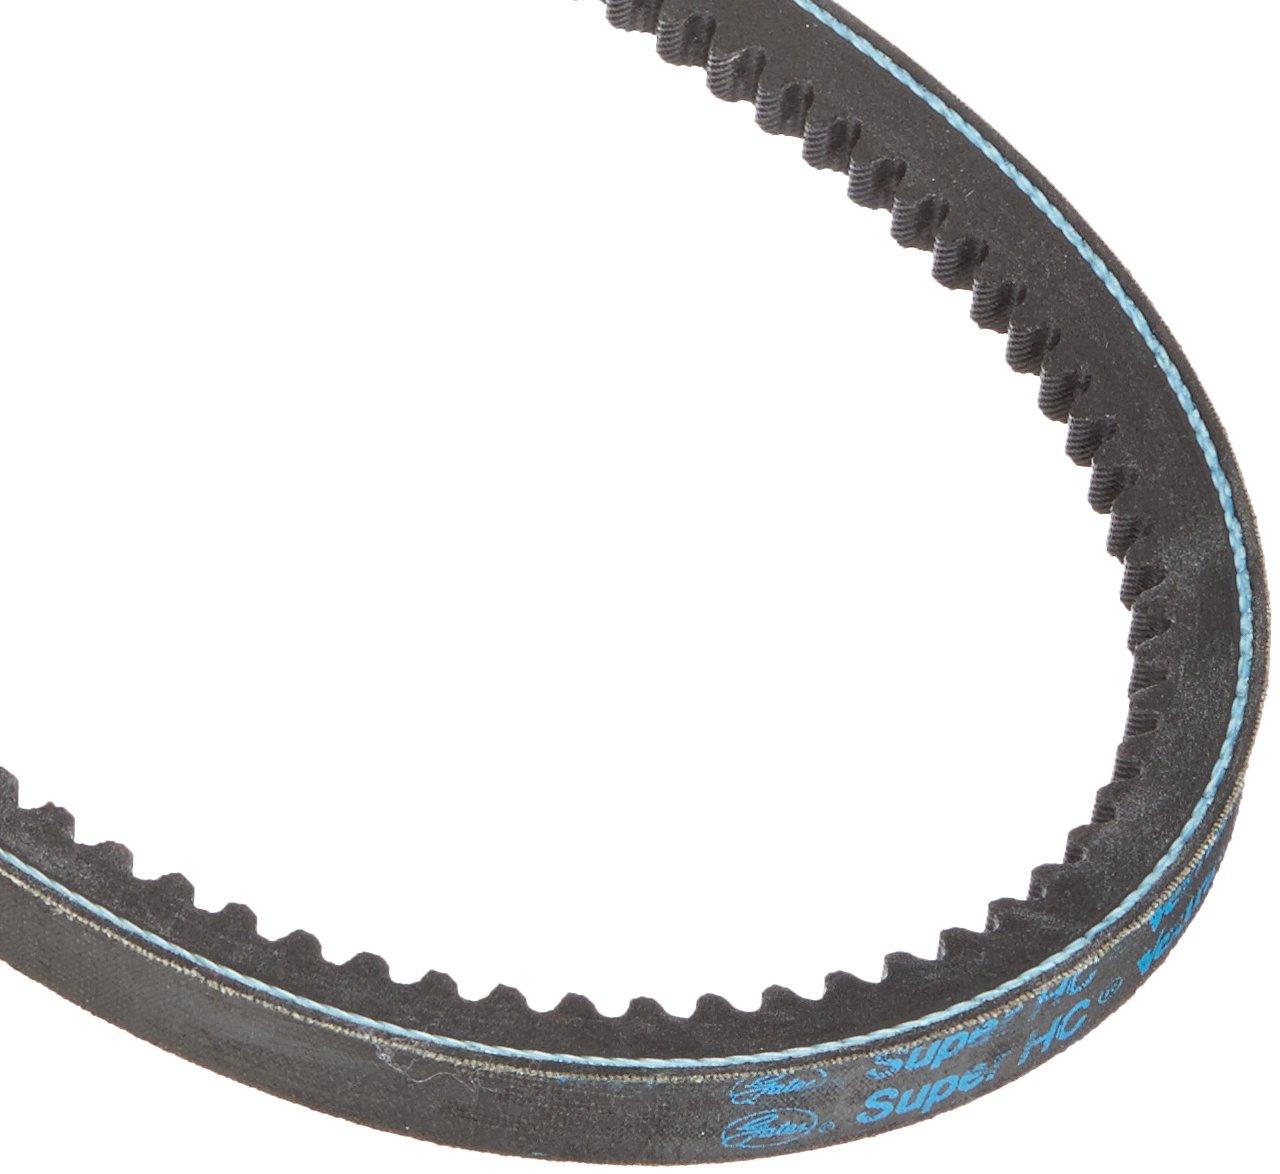 5//8 Width Gates 5VX1400 Super HC Molded Notch Belt 140 Belt Outside Circumference 5//8 Width 35//64 Height 140 Belt Outside Circumference 94141400 5VX Section 35//64 Height